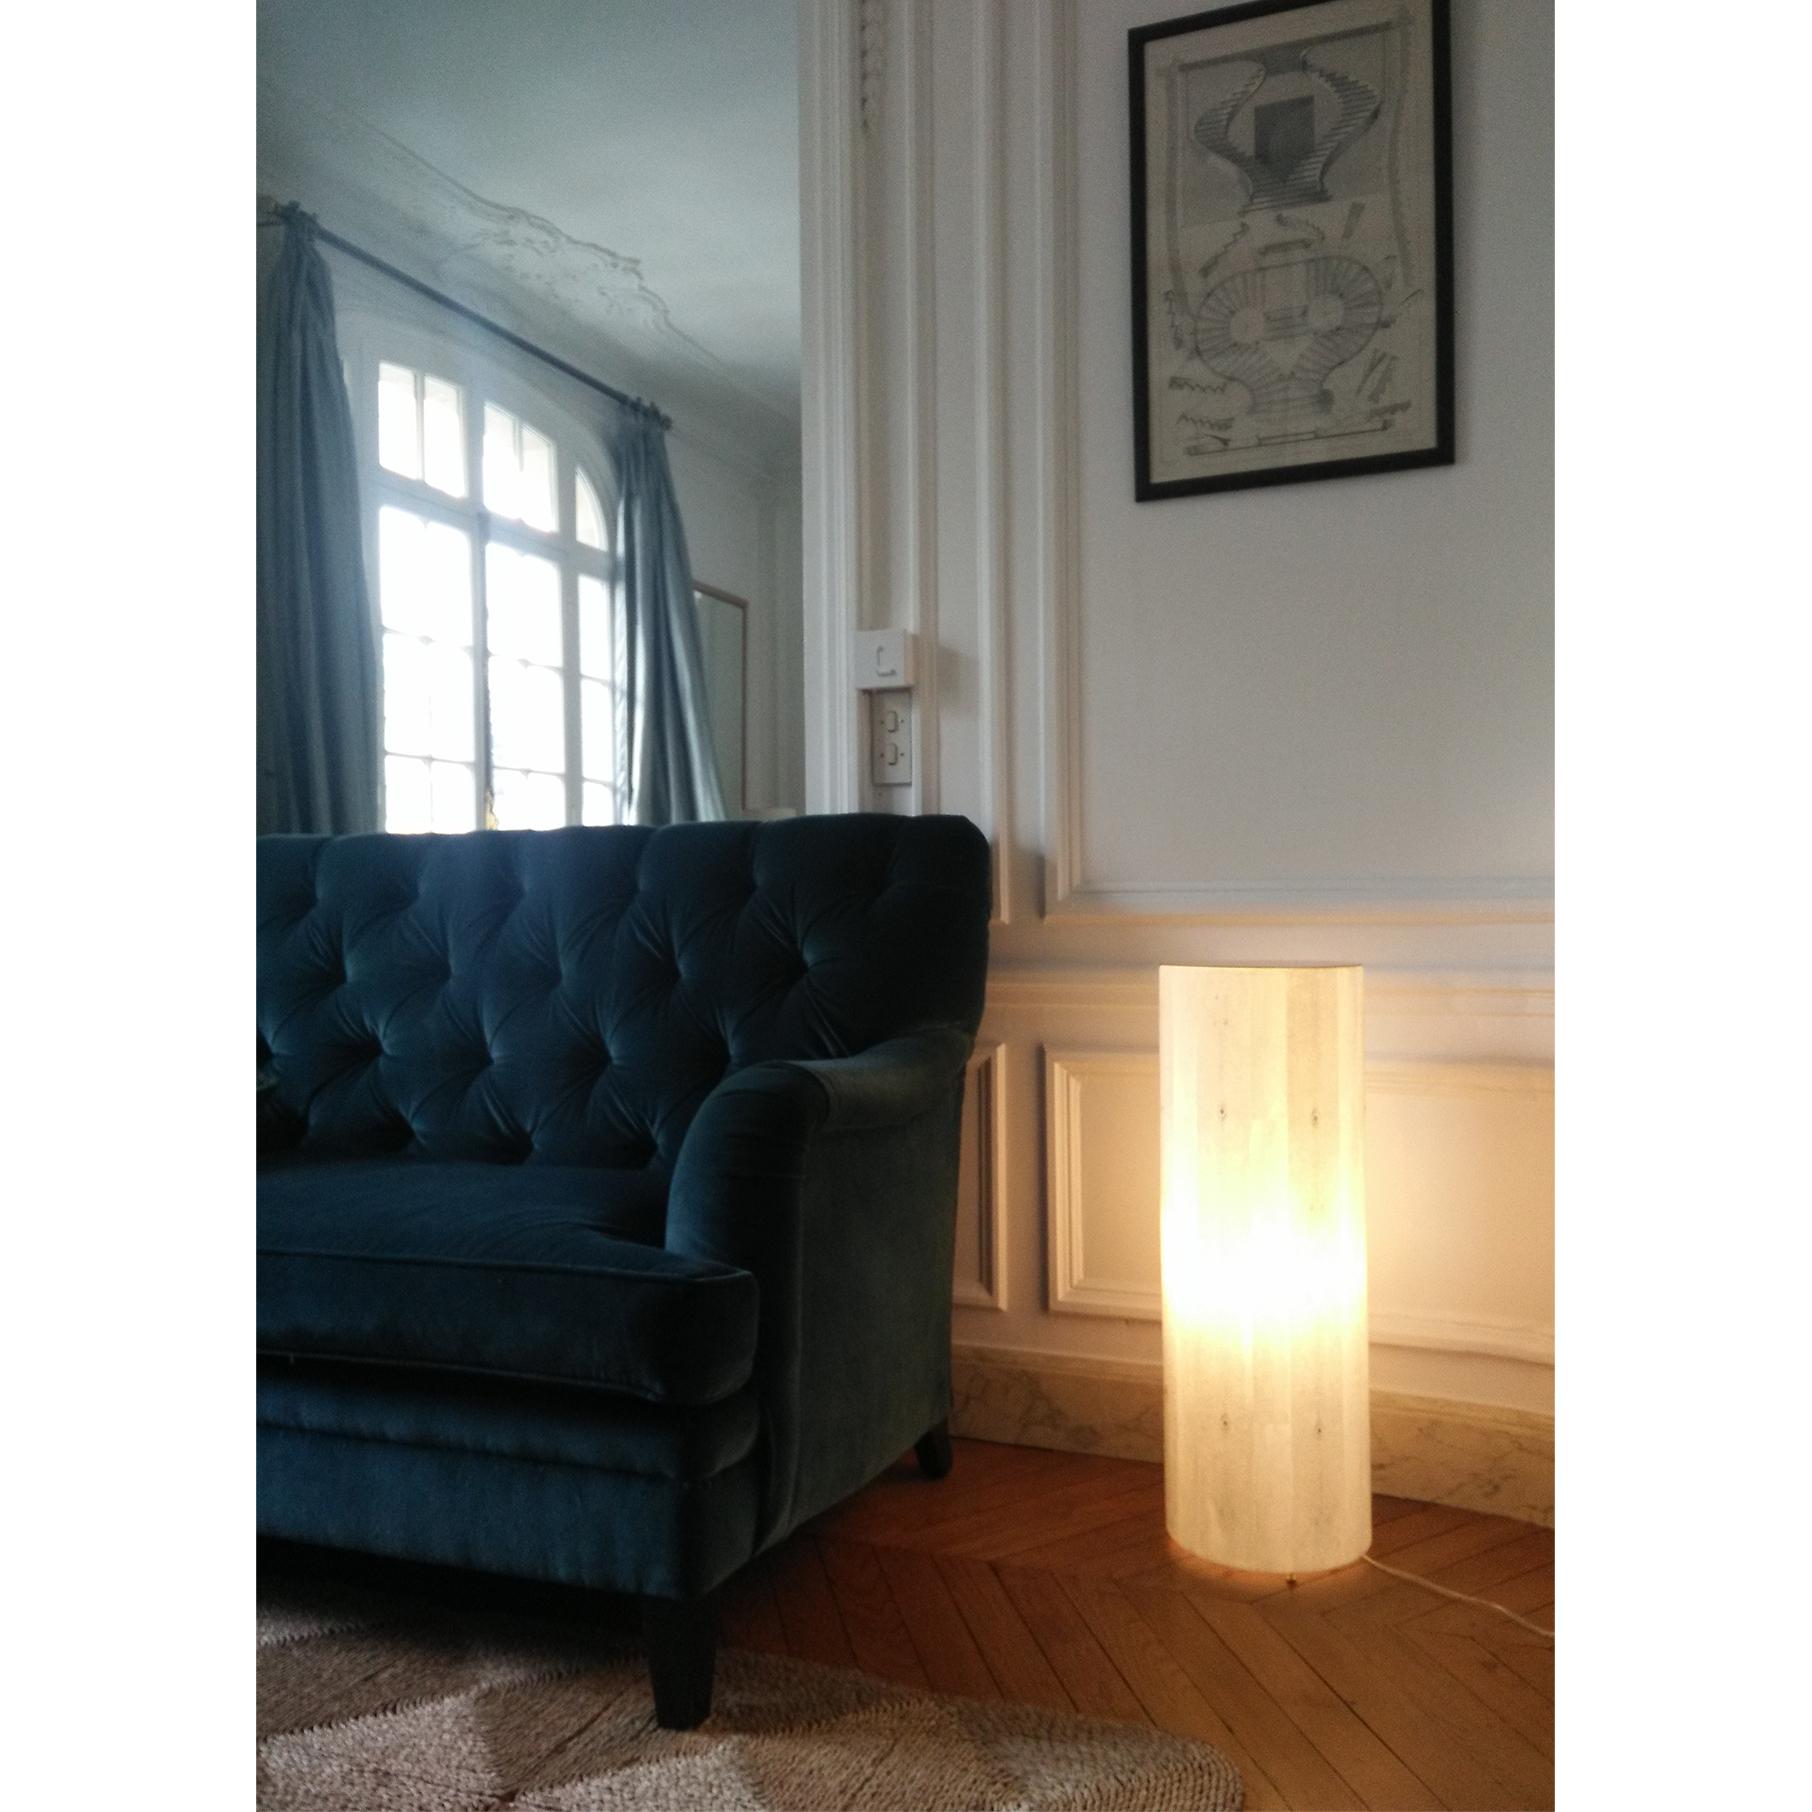 Colonne lumineuse - Collection lampes - particuliers - Paris